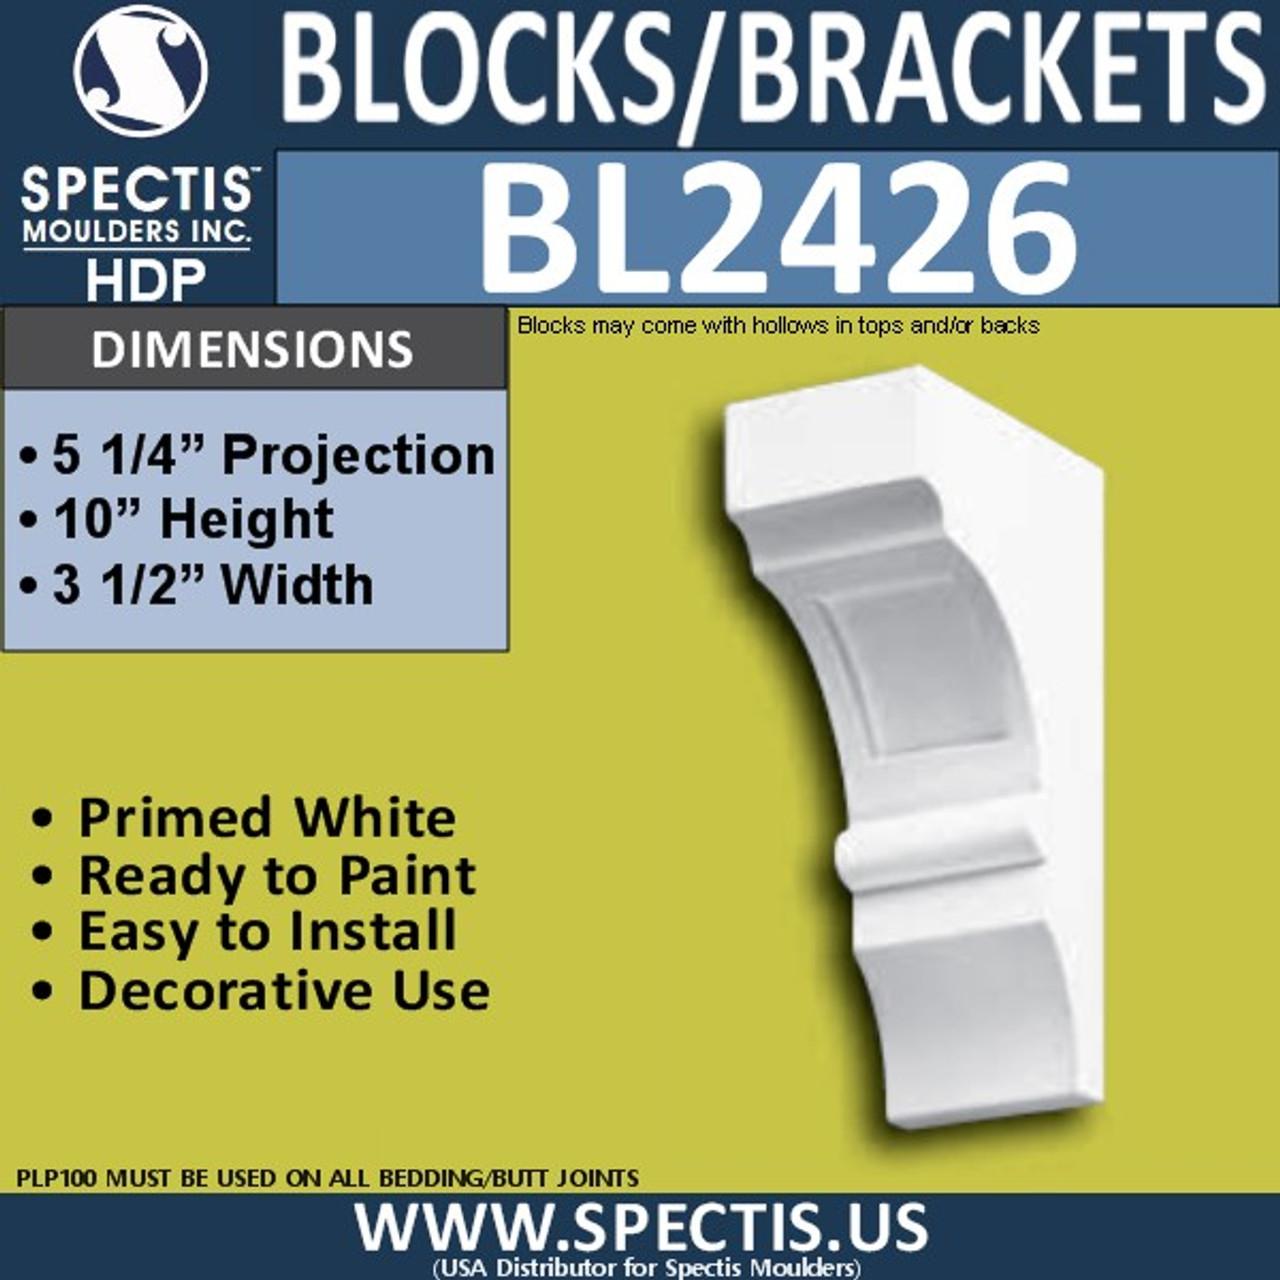 "BL2426 Eave Block or Bracket 3.5""W x 10""H x 5.25"" P"